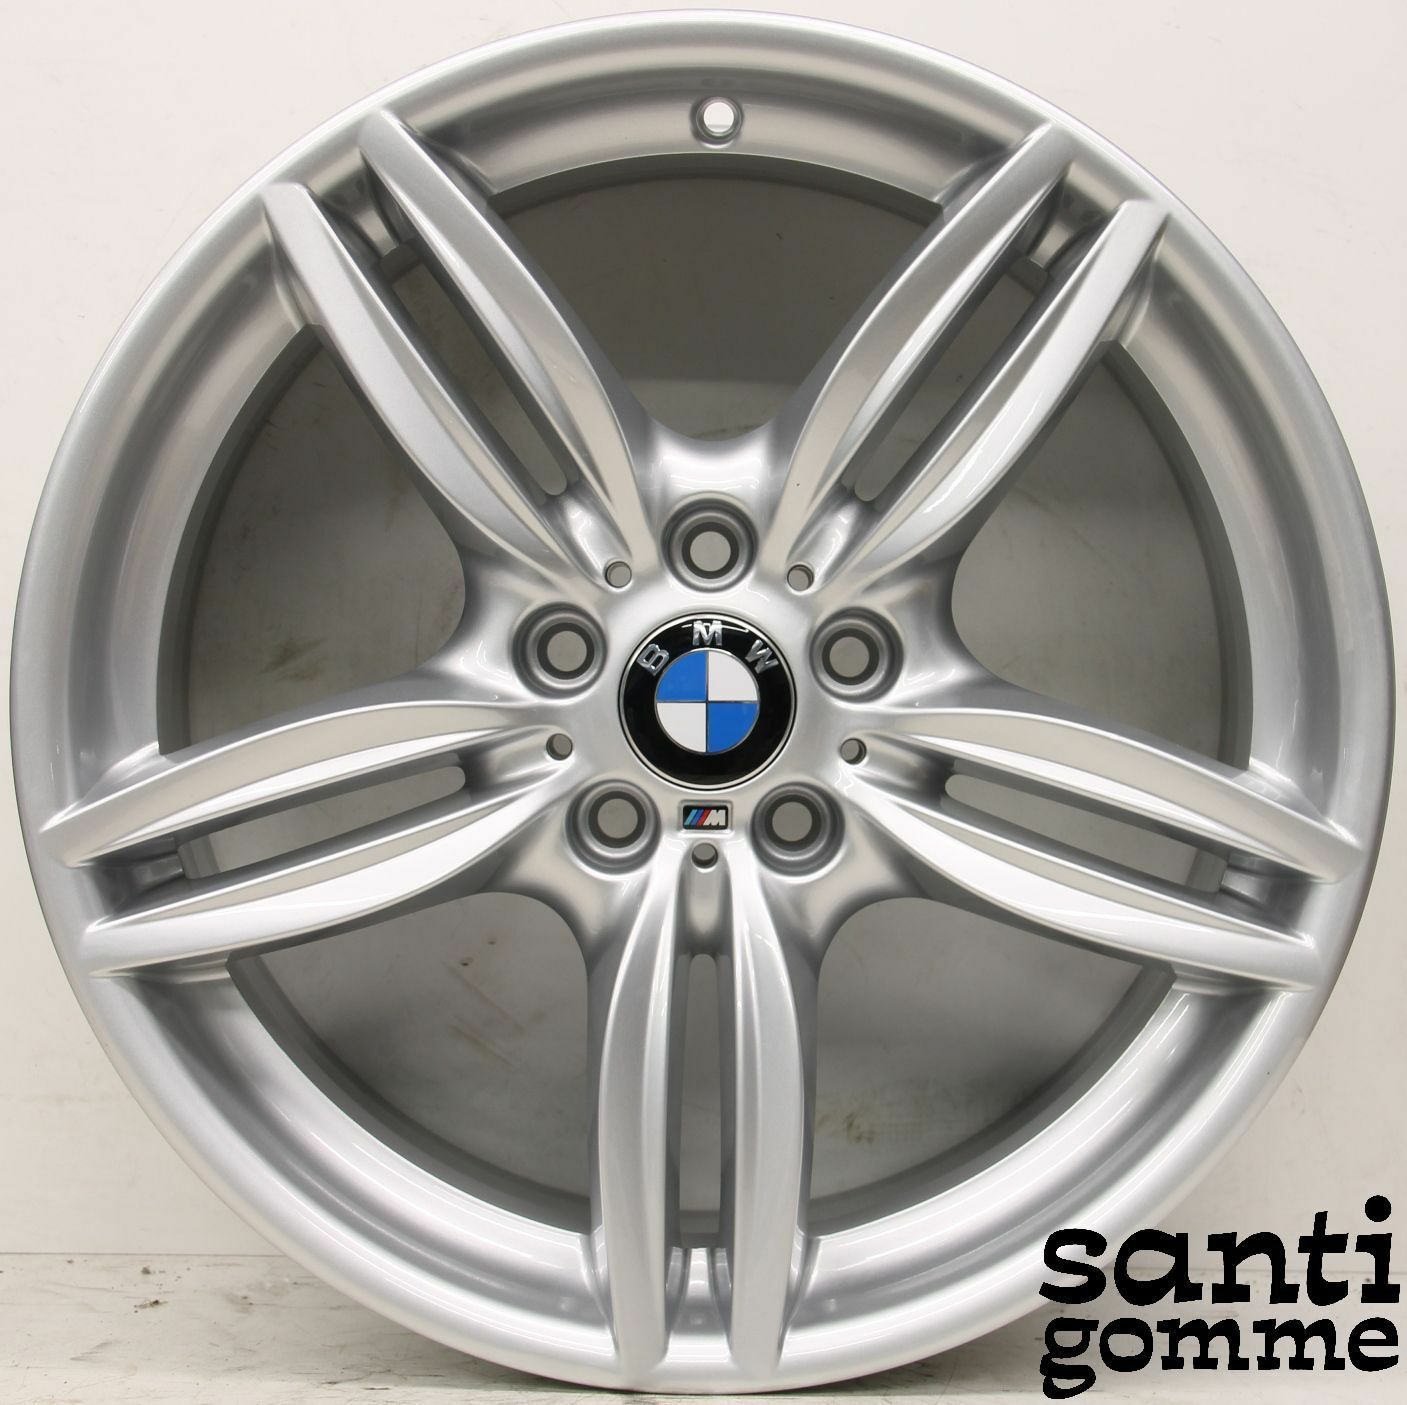 20 x M14X1.25 Argento 60 ° Cerchi in Lega Bulloni filettatura 33mm si adatta BMW F25 G39 F01